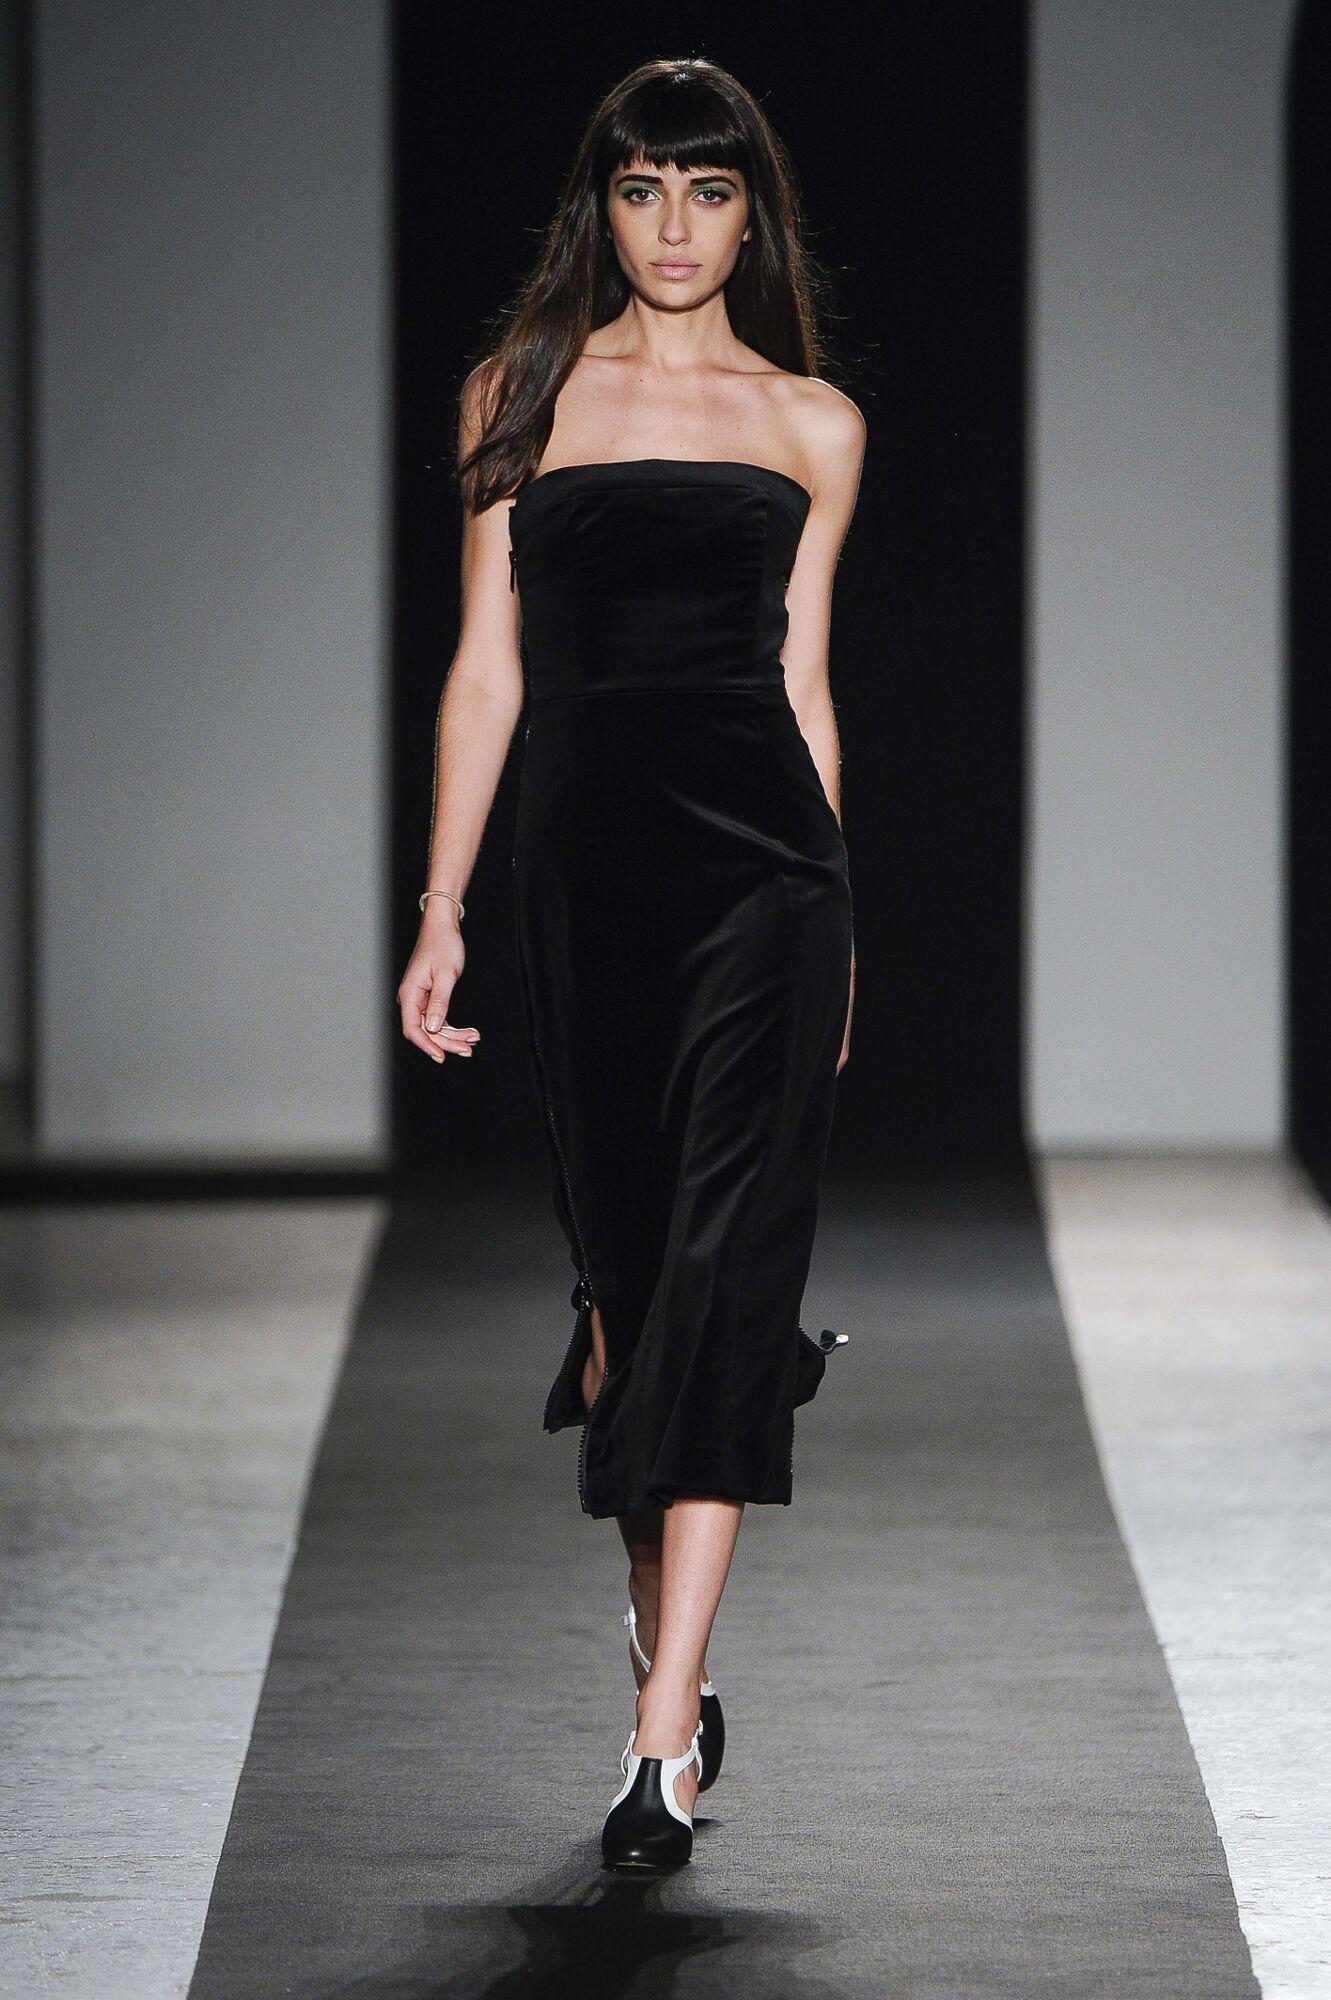 Winter Dress Trends 2014 Woman